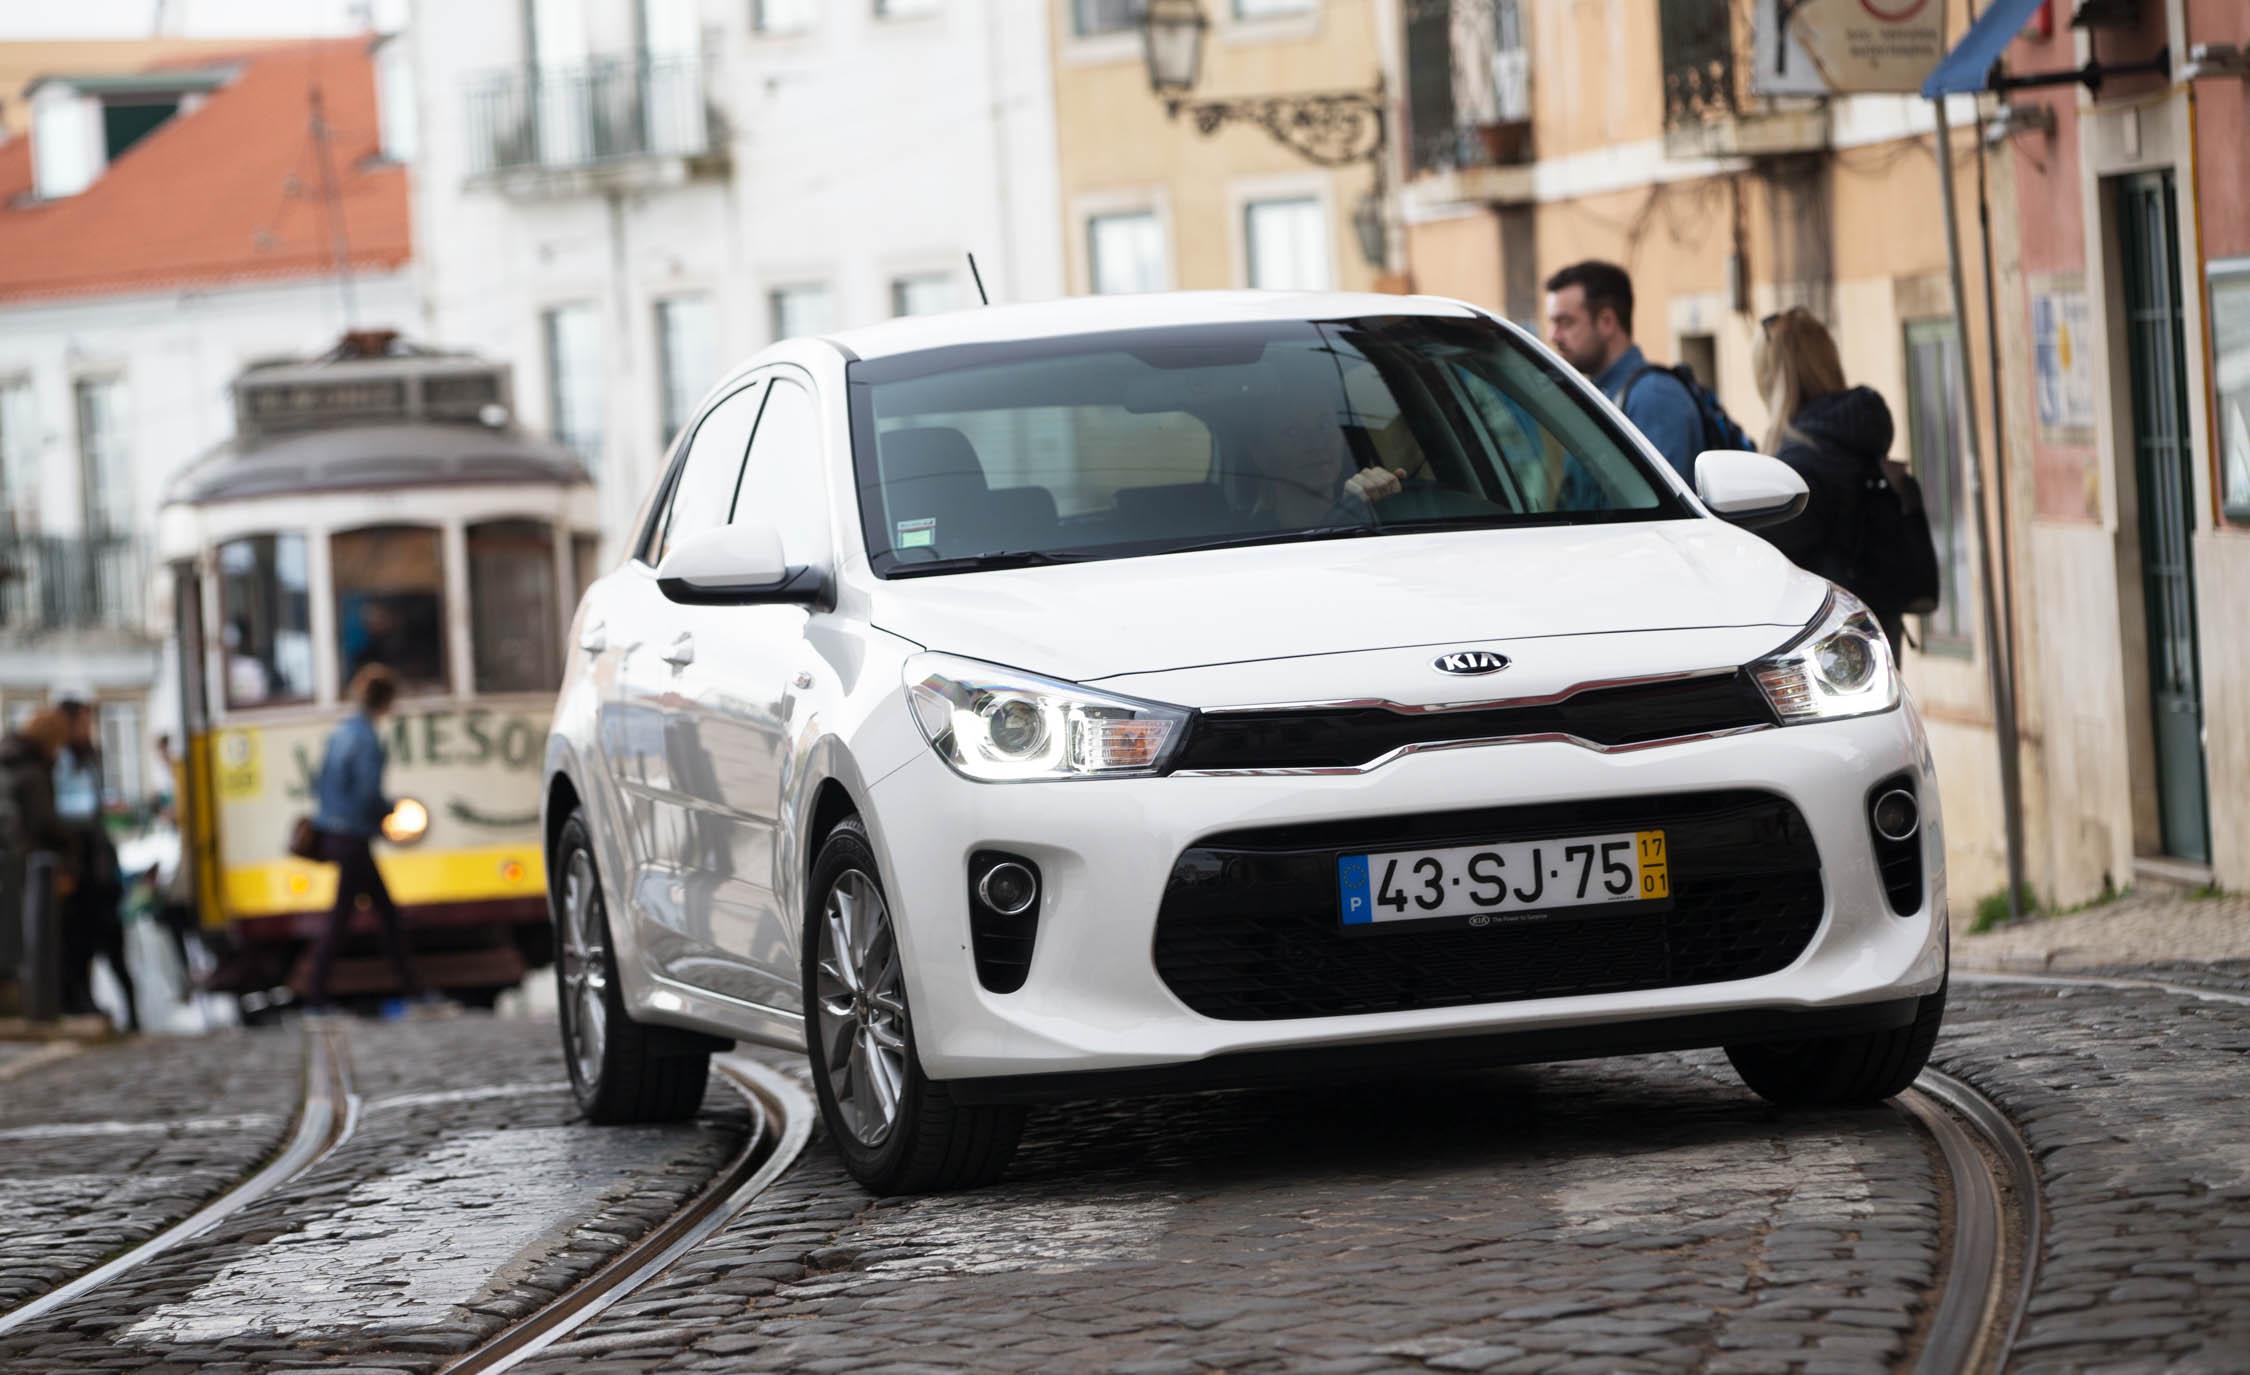 2018 Kia Rio | Cars Exclusive Videos and Photos Updates